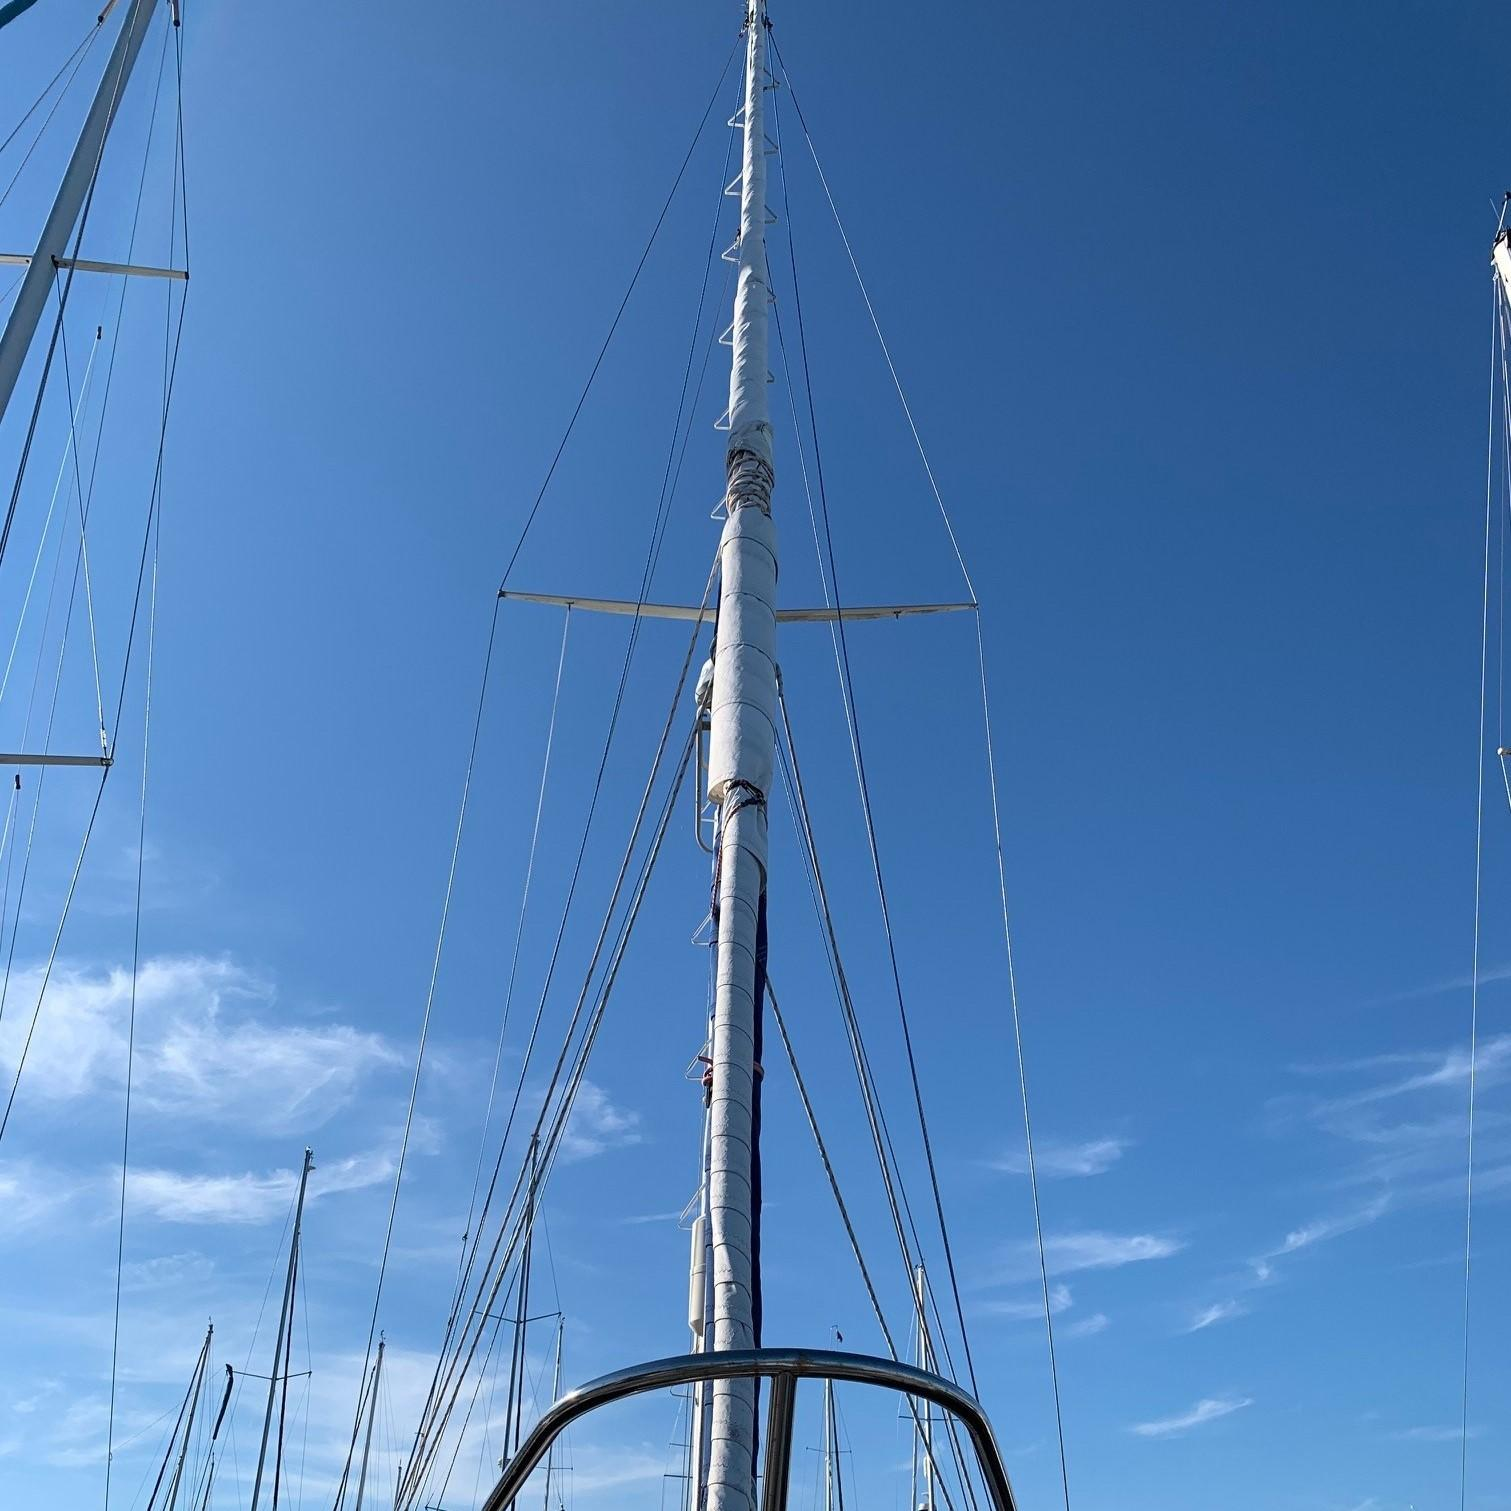 Climbing steps on mast